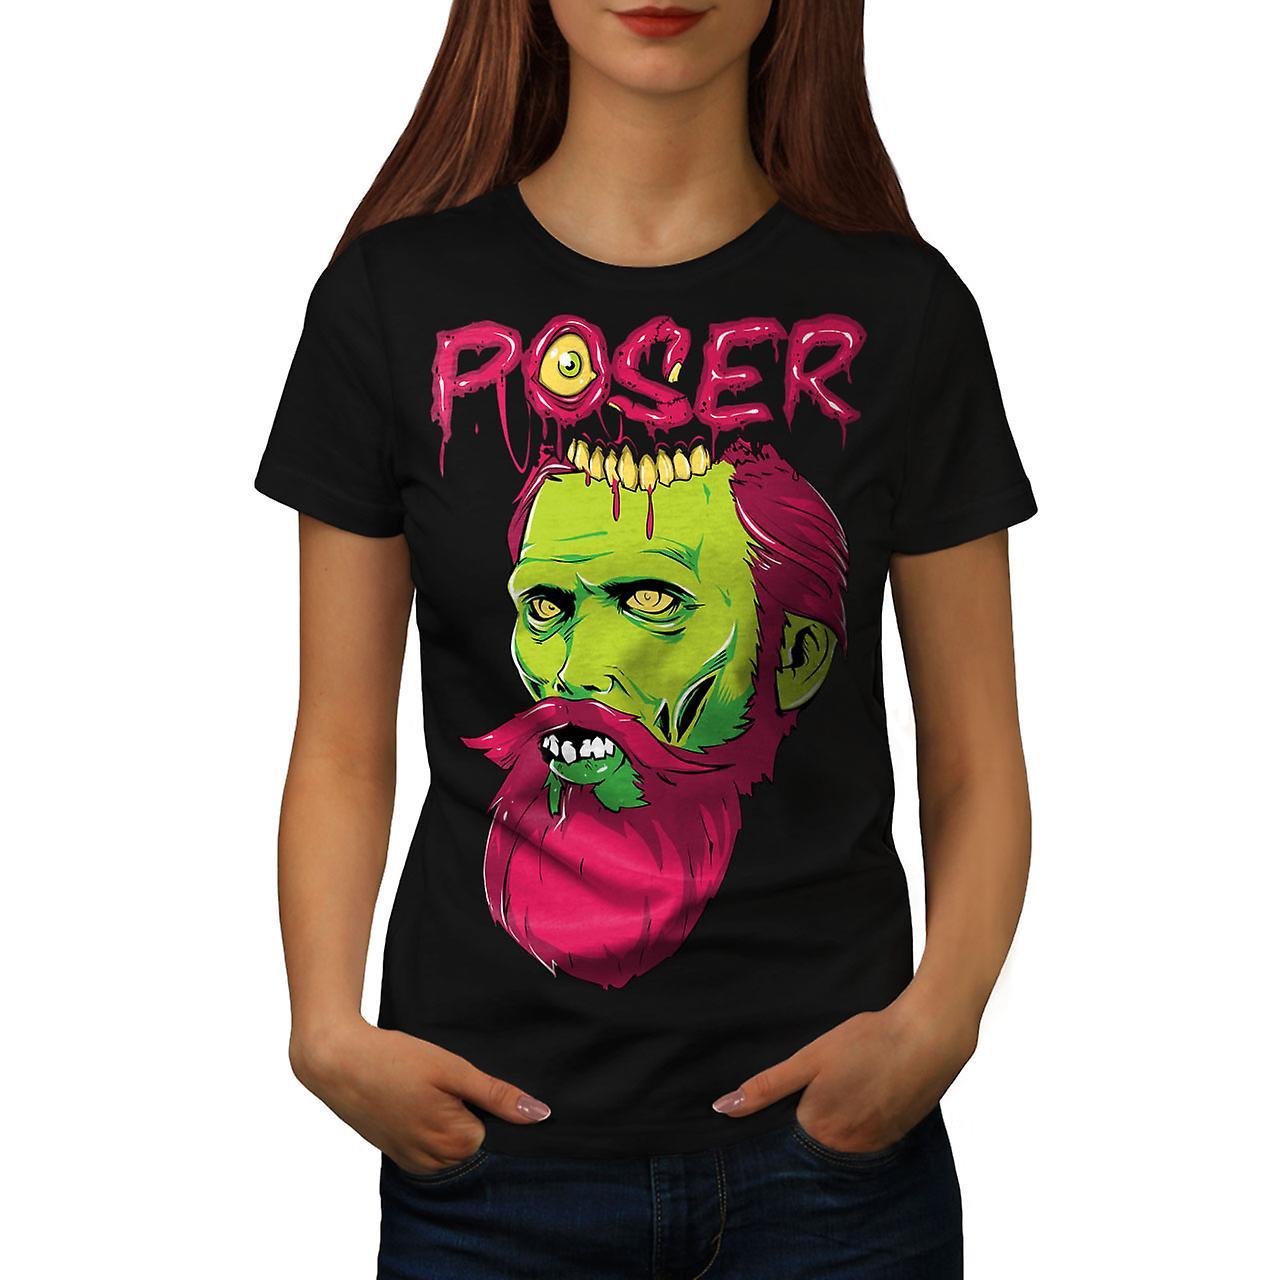 Poser Monster Rock Zombie Women Black T-shirt | Wellcoda